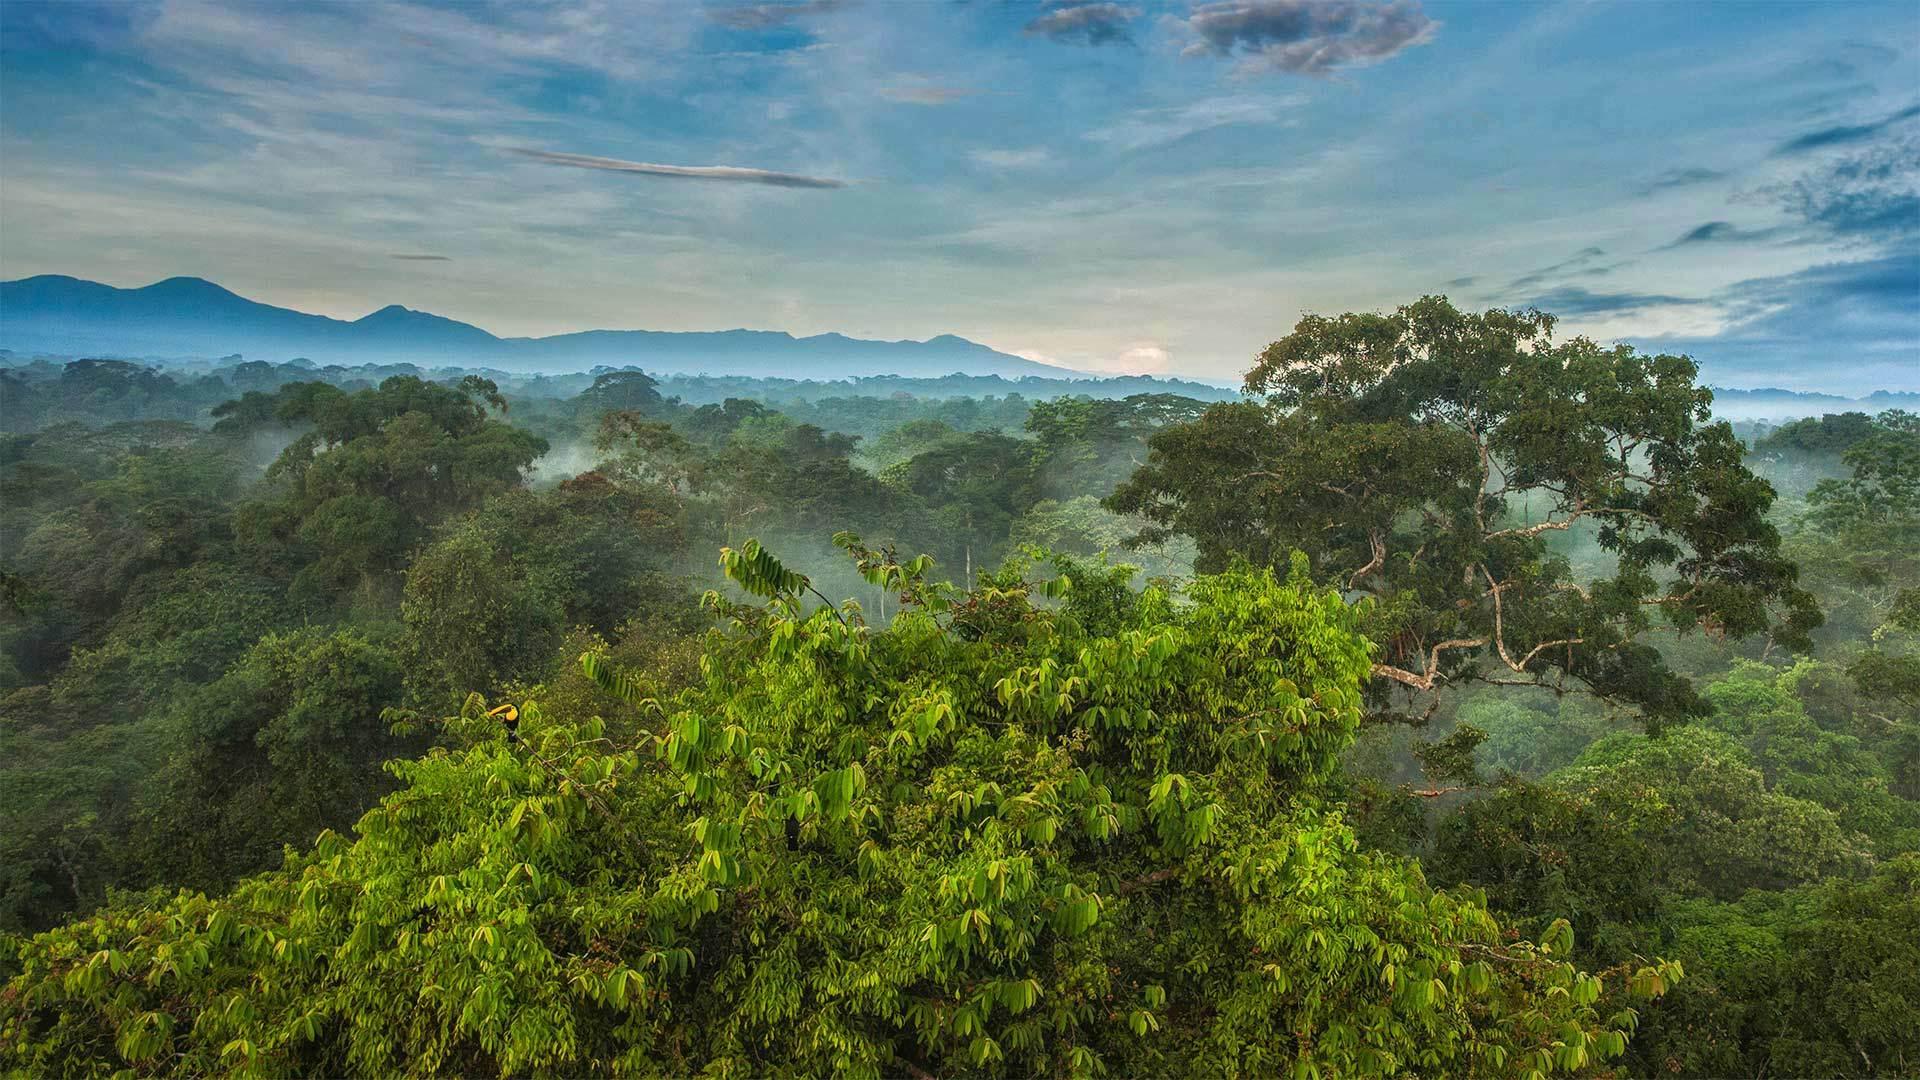 La Selva生物站热带雨林canopy(树冠)上的黑嘴巨嘴鸟canopy